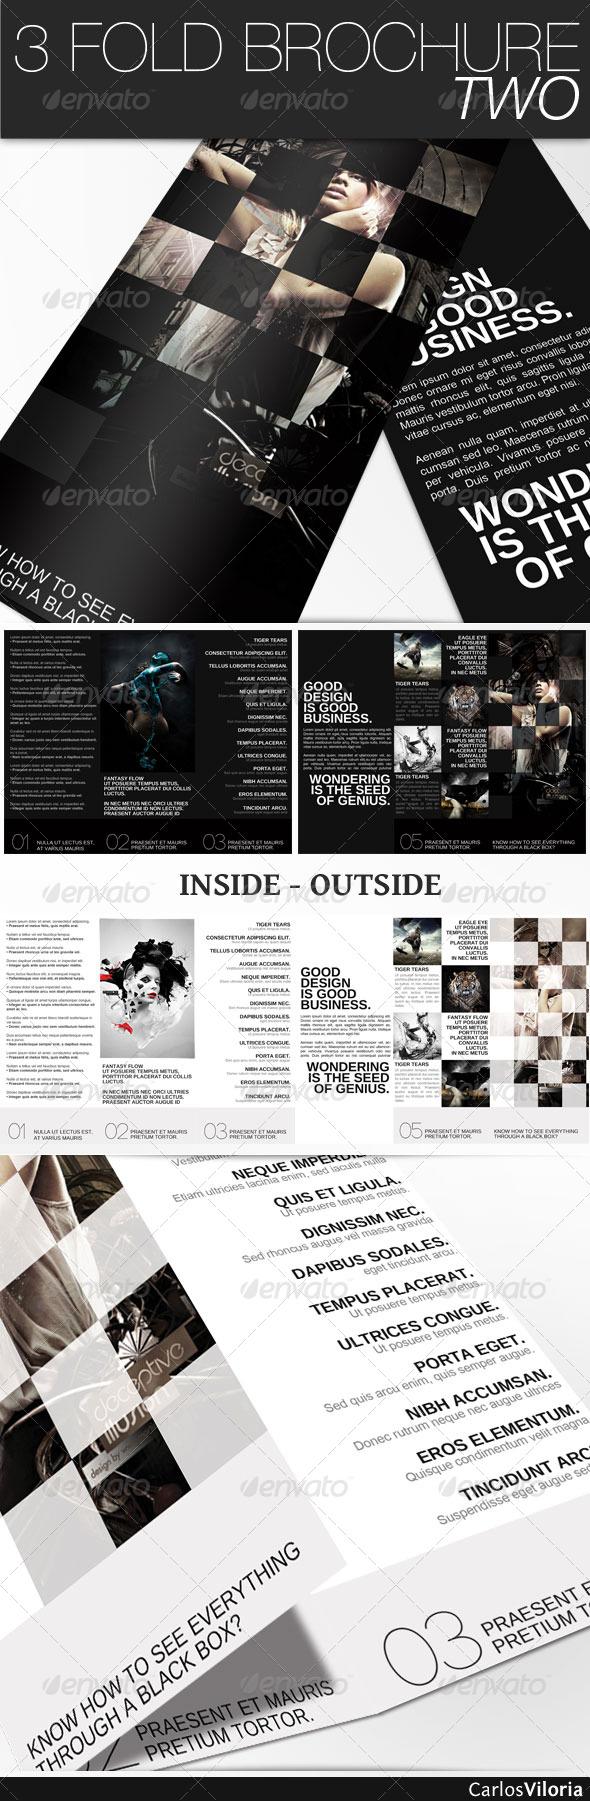 3 Fold Brochure II